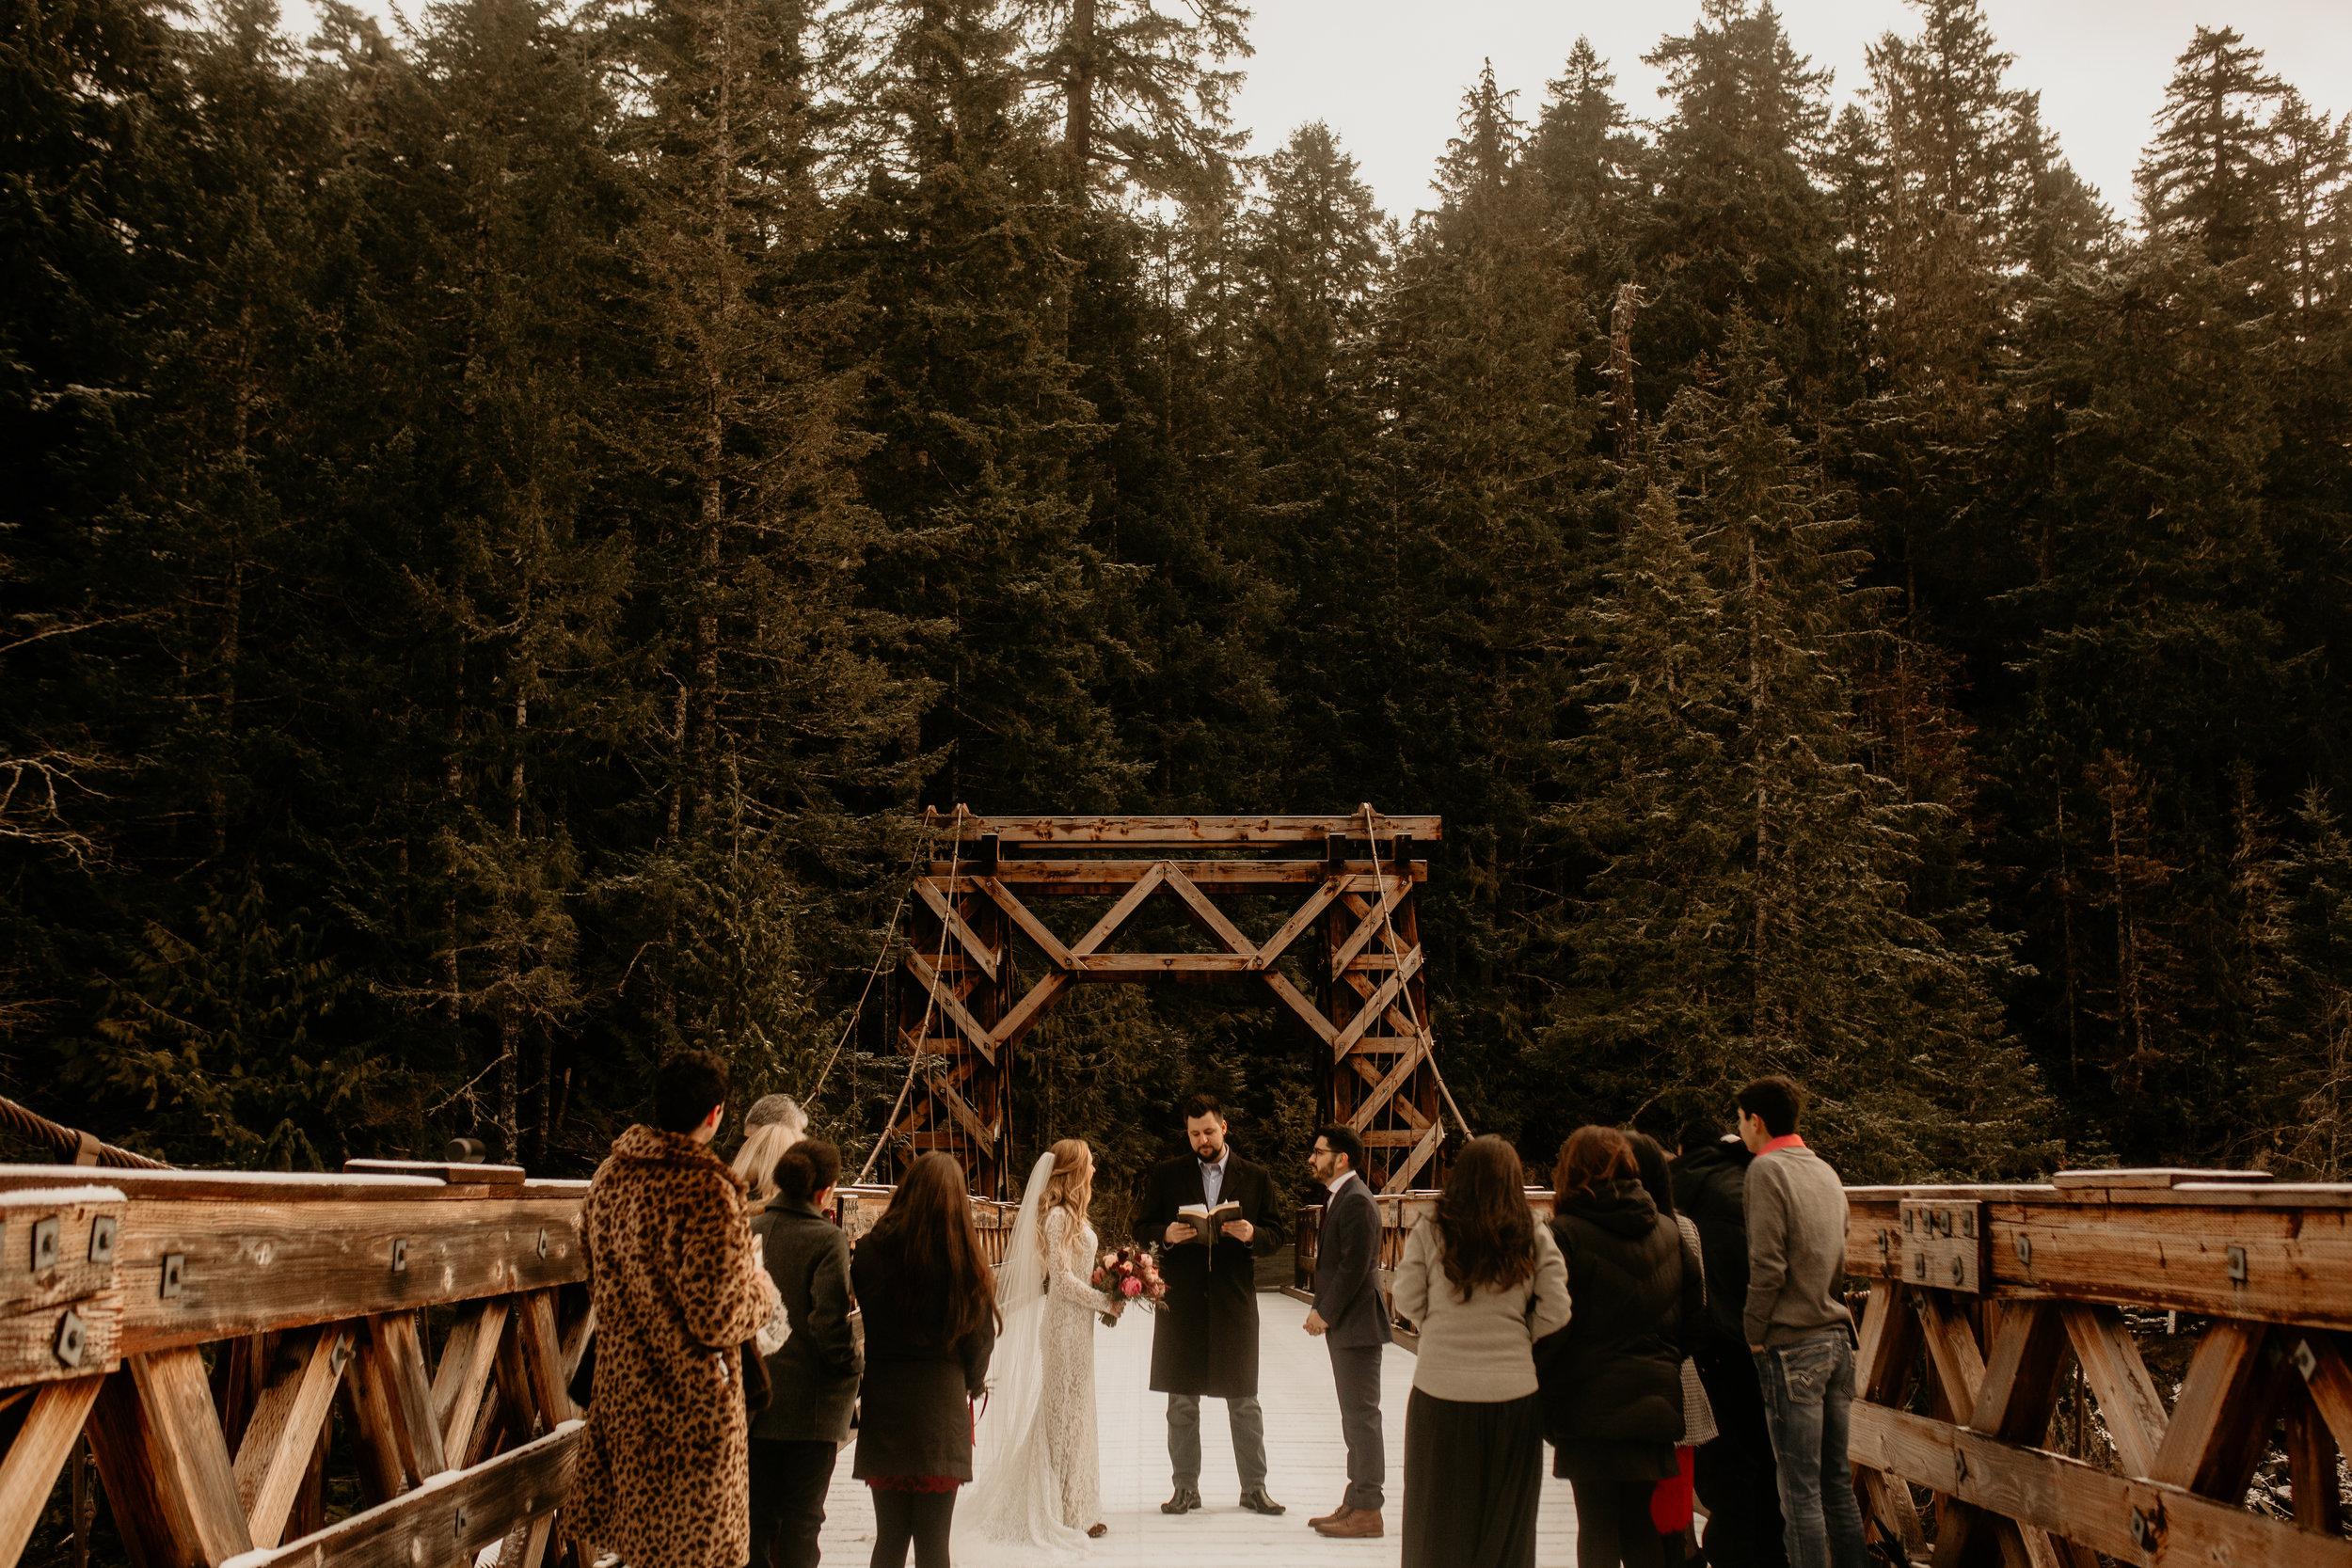 Mount-Rainier-longmeyer-Bridge-elopement-photographer-Ceremony -27.jpg